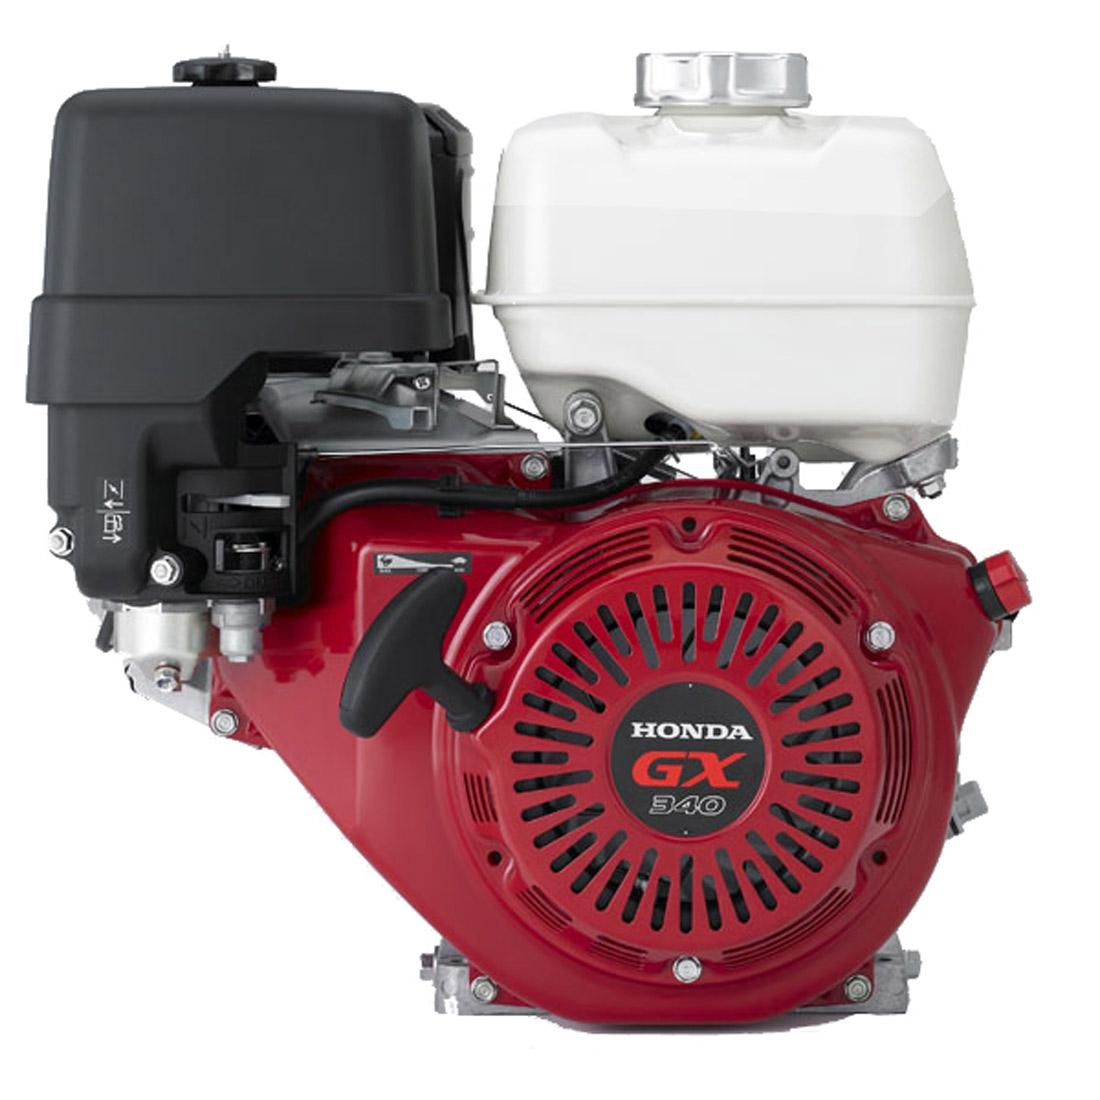 honda 11 hp engine diagram enthusiast wiring diagrams u2022 rh rasalibre co Honda GX340 Torque Specs Honda GX340 Specs